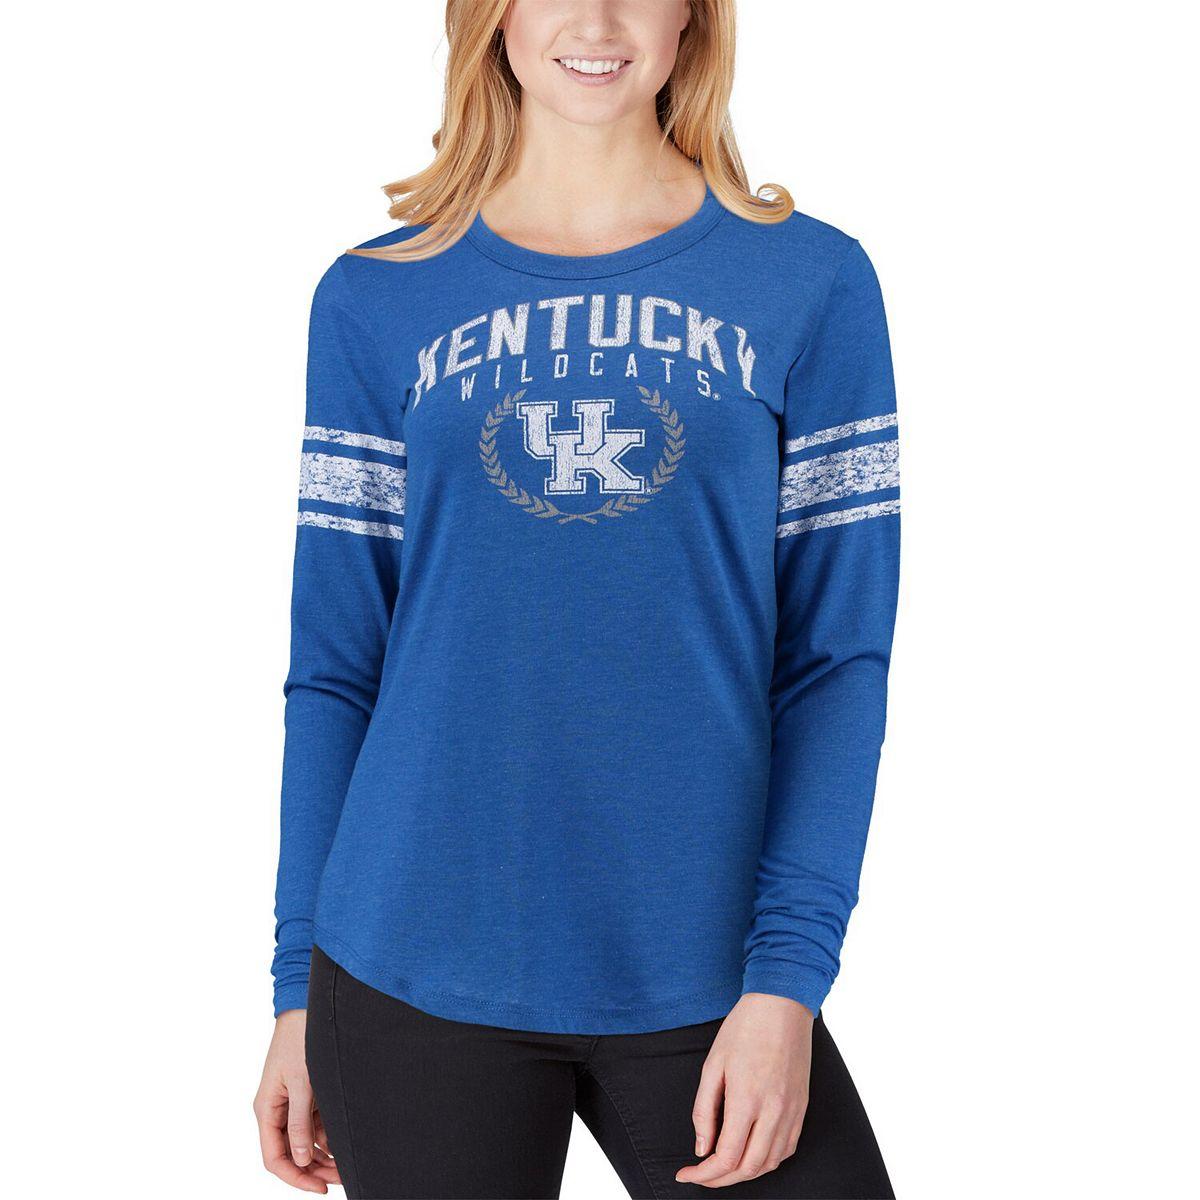 Women's Top of the World Royal Kentucky Wildcats Favorite Laurels Long Sleeve T-Shirt DH4Sw